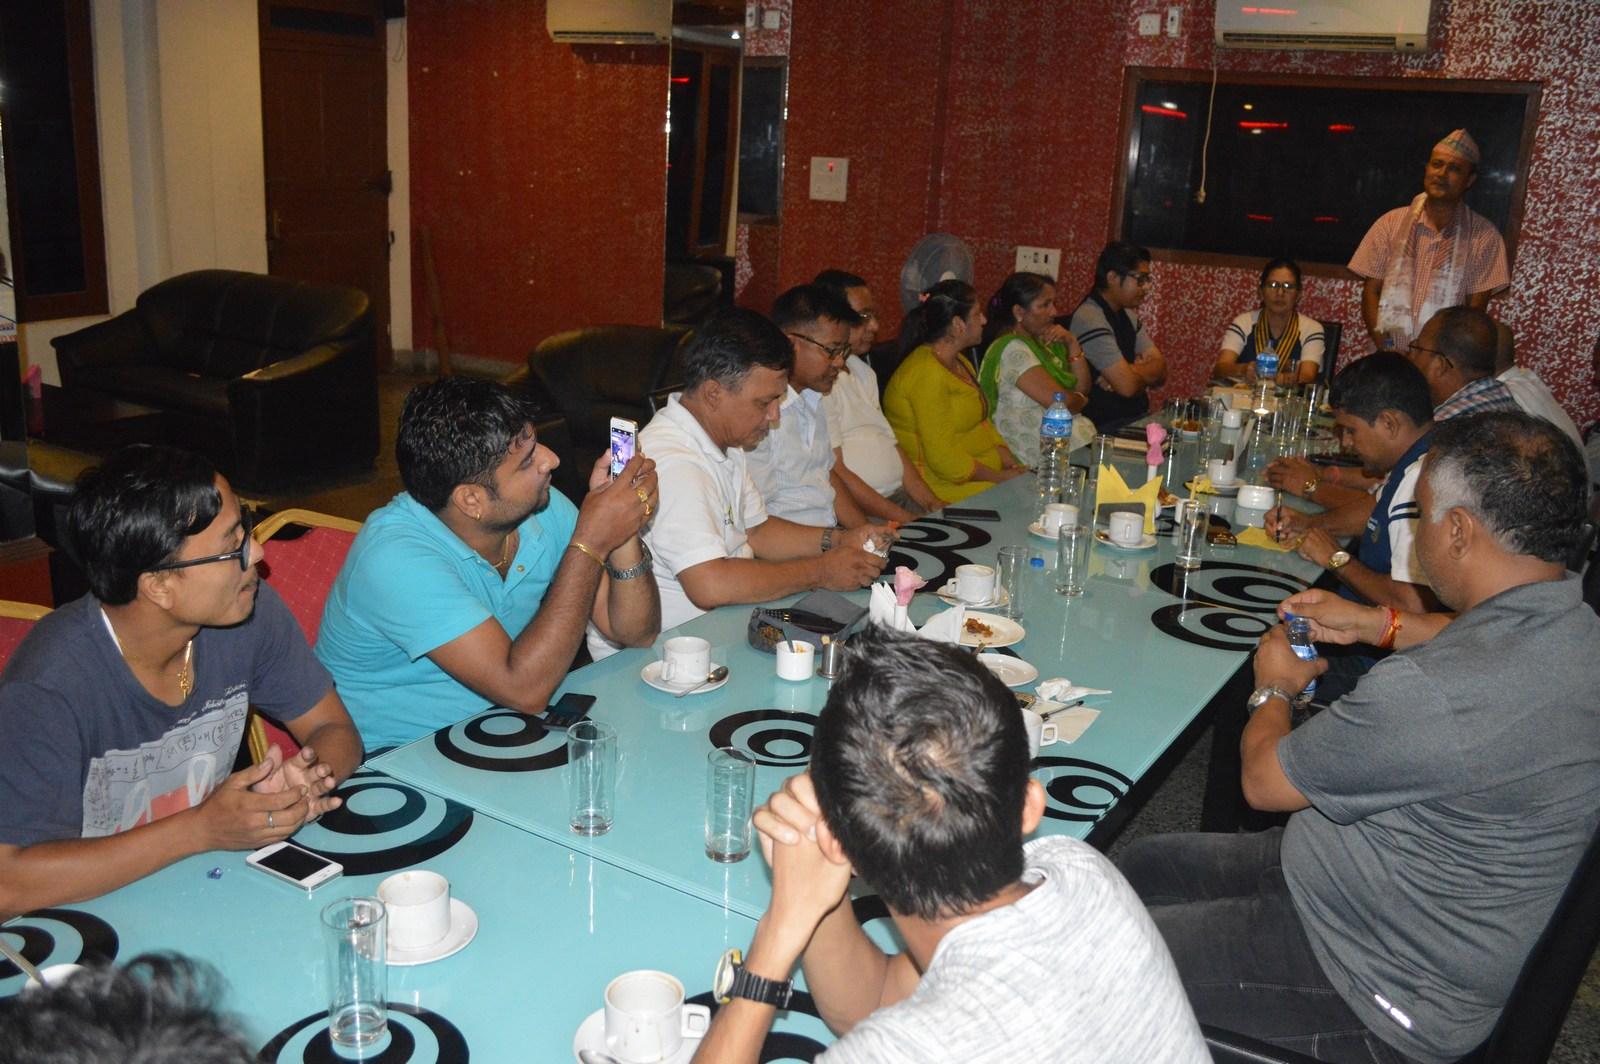 Weekly-Meeting-with-the-Guest-Speaker-DSP-Durga-Raj-Regmi-Rotary-Club-of-Kakarvitta-12